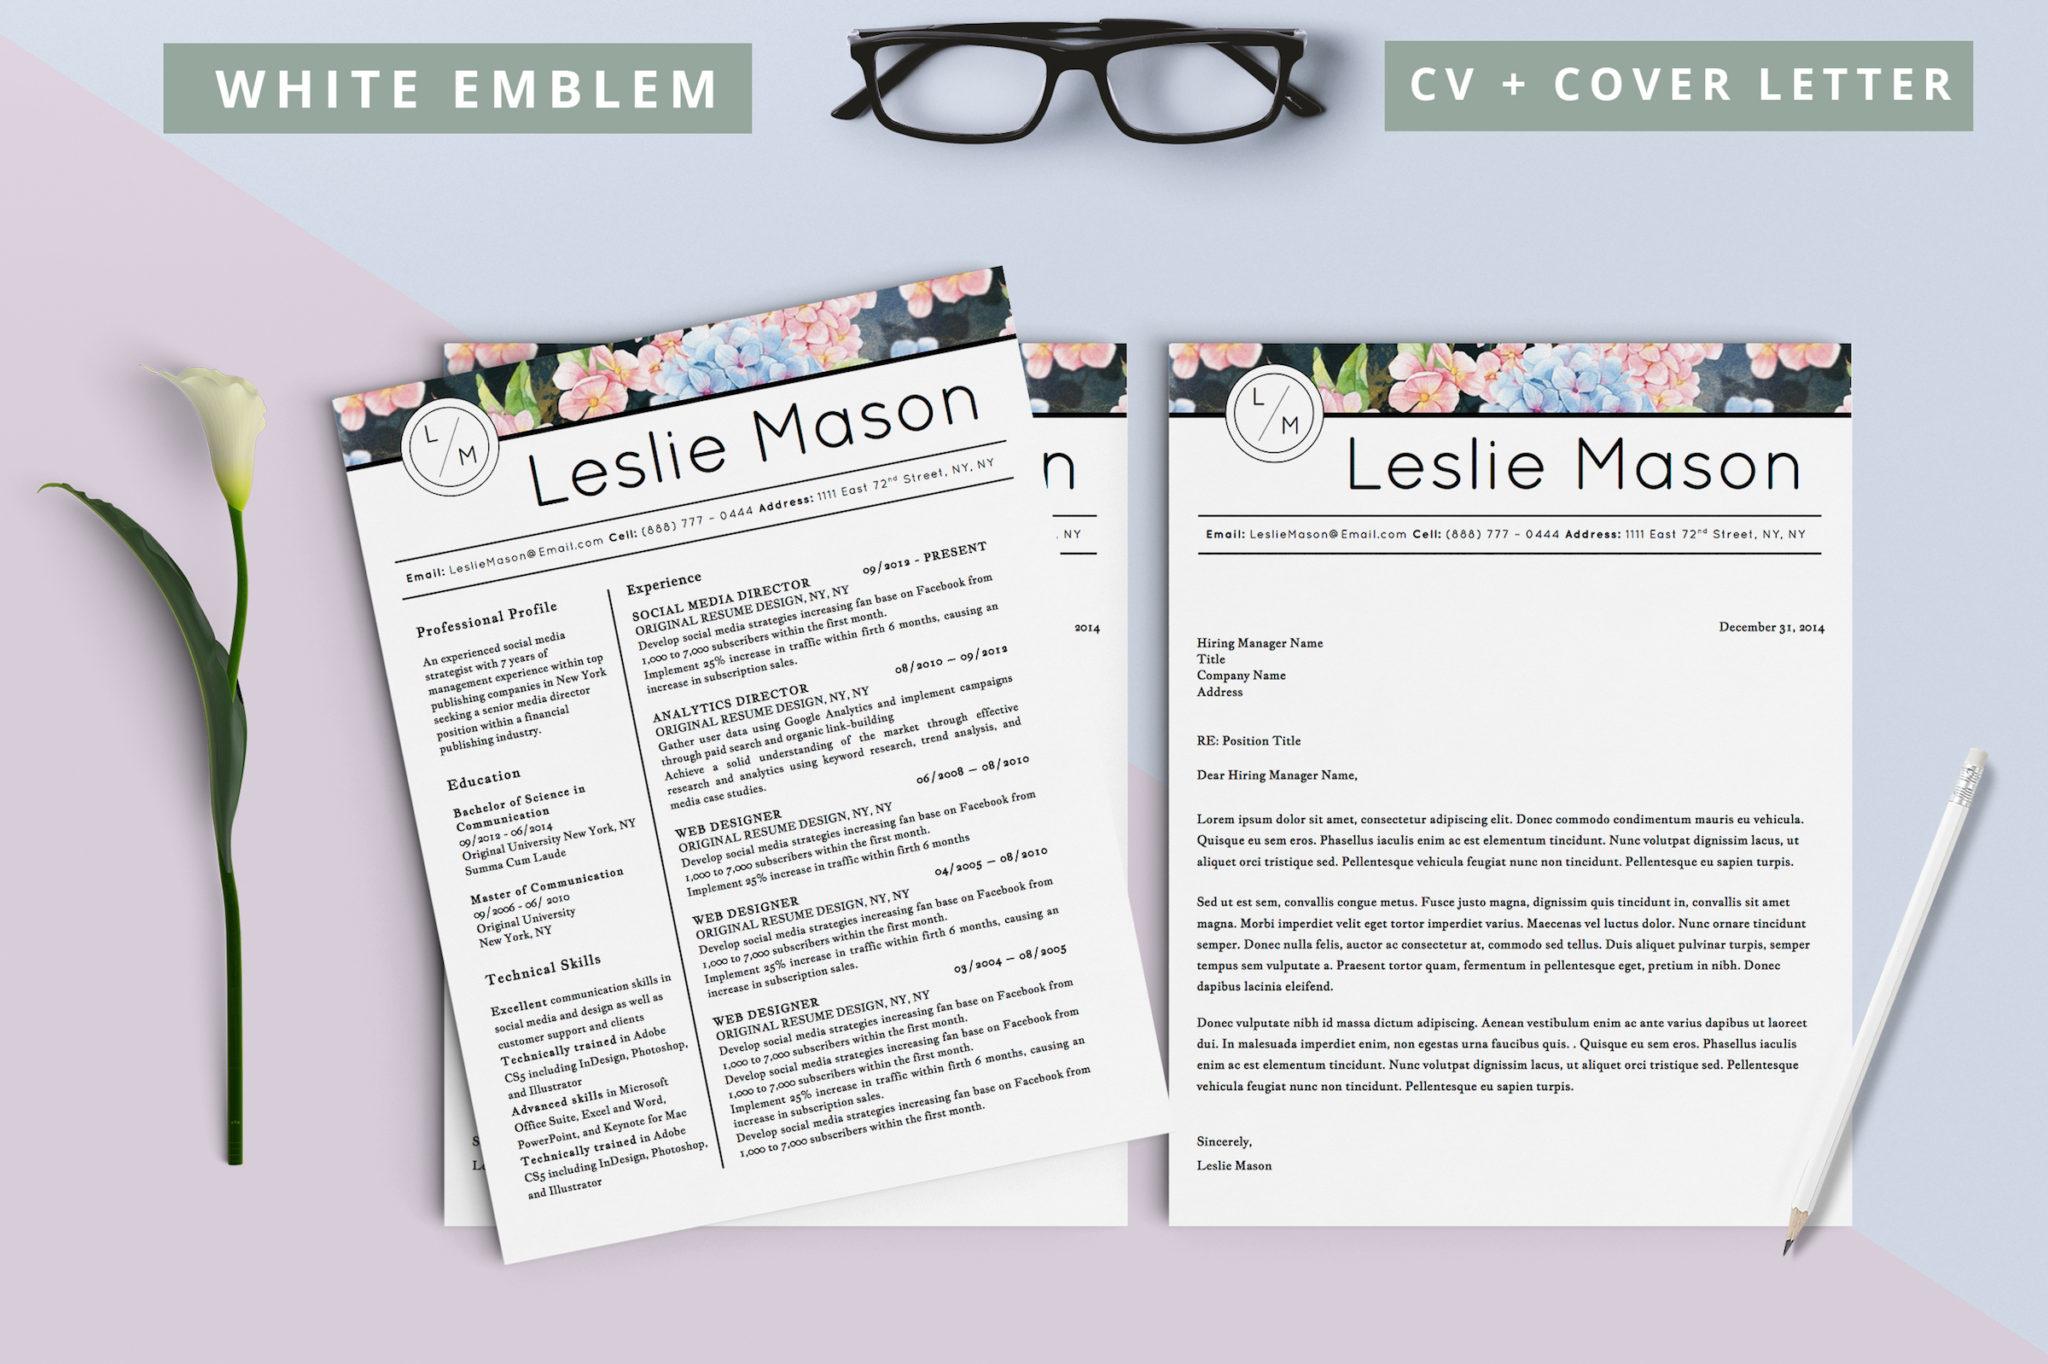 leslie mason Death record and obituary for mrs leslie mason from huntersville, north carolina.